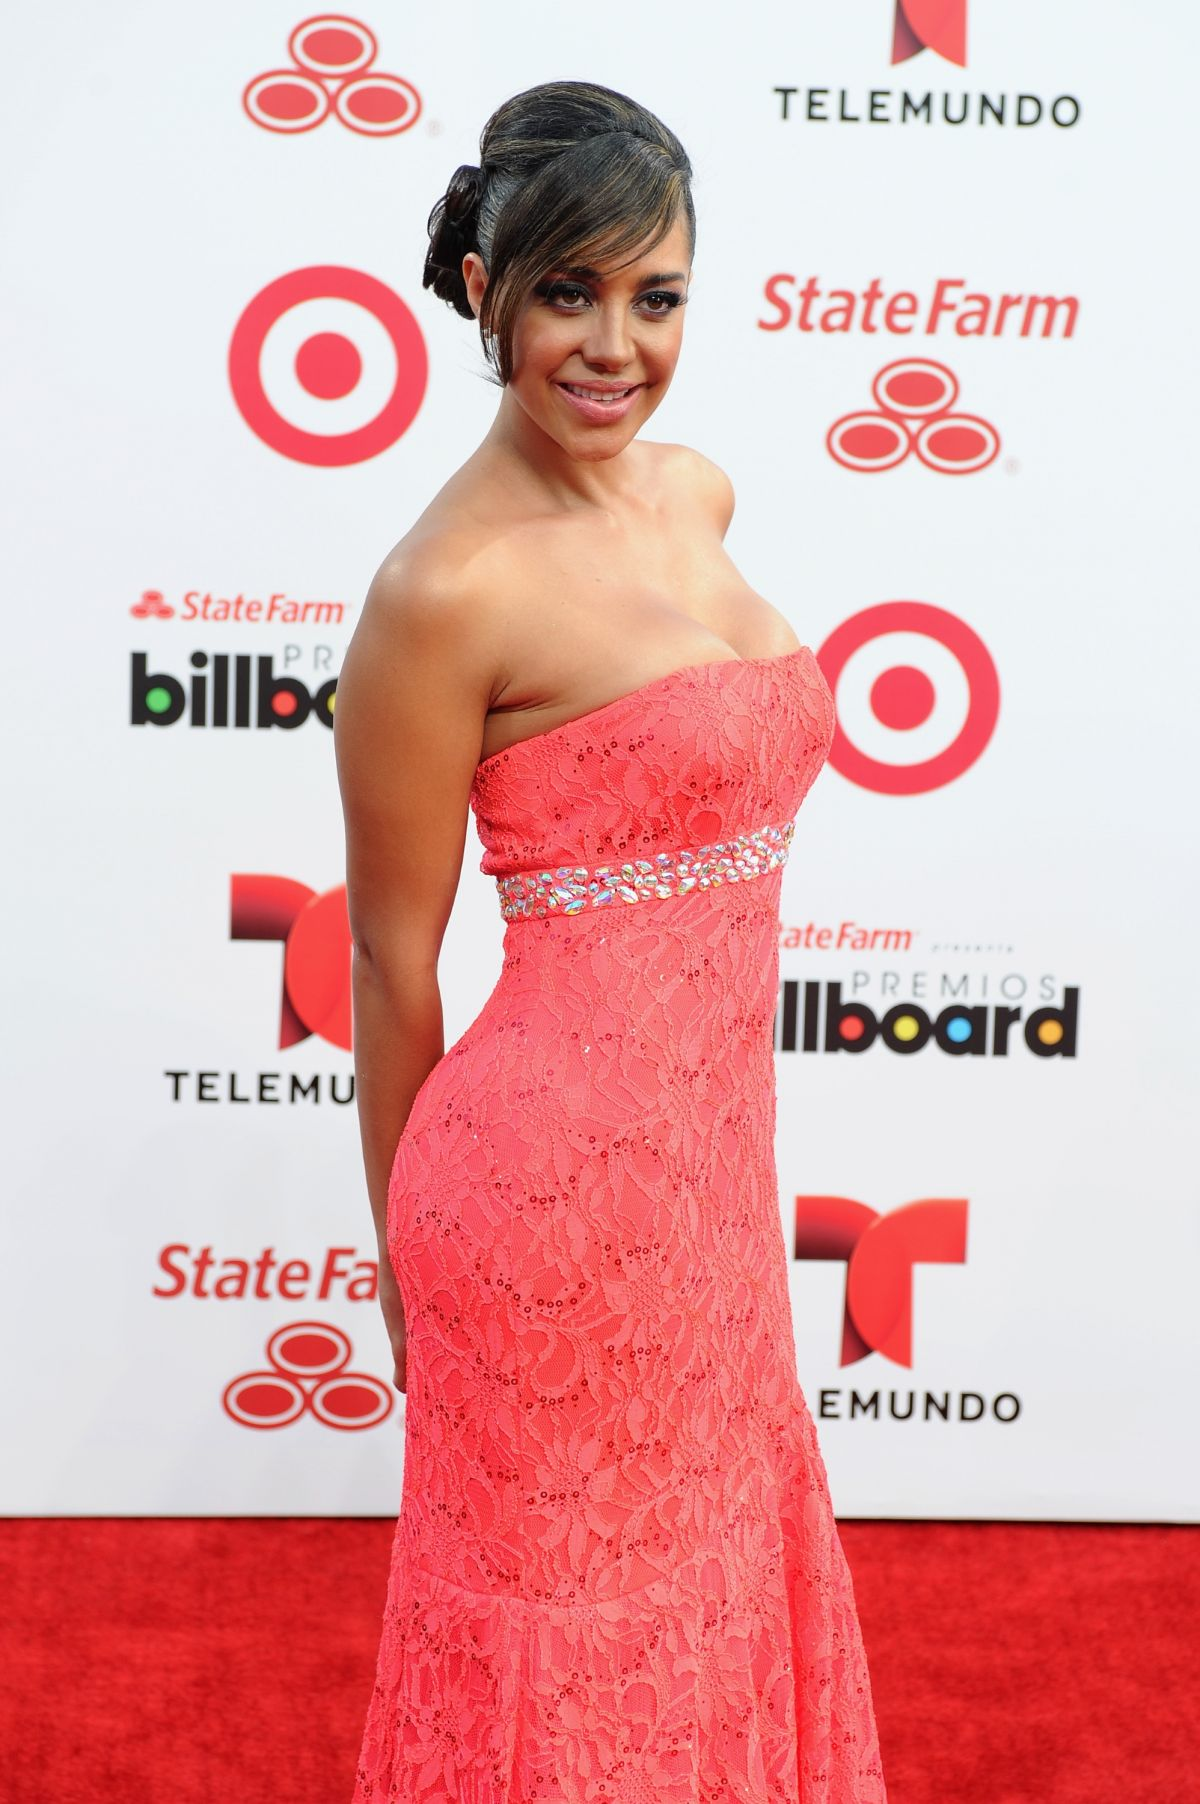 ANDREA CALLE at 2014 Billboard Latin Music Awards in Miami